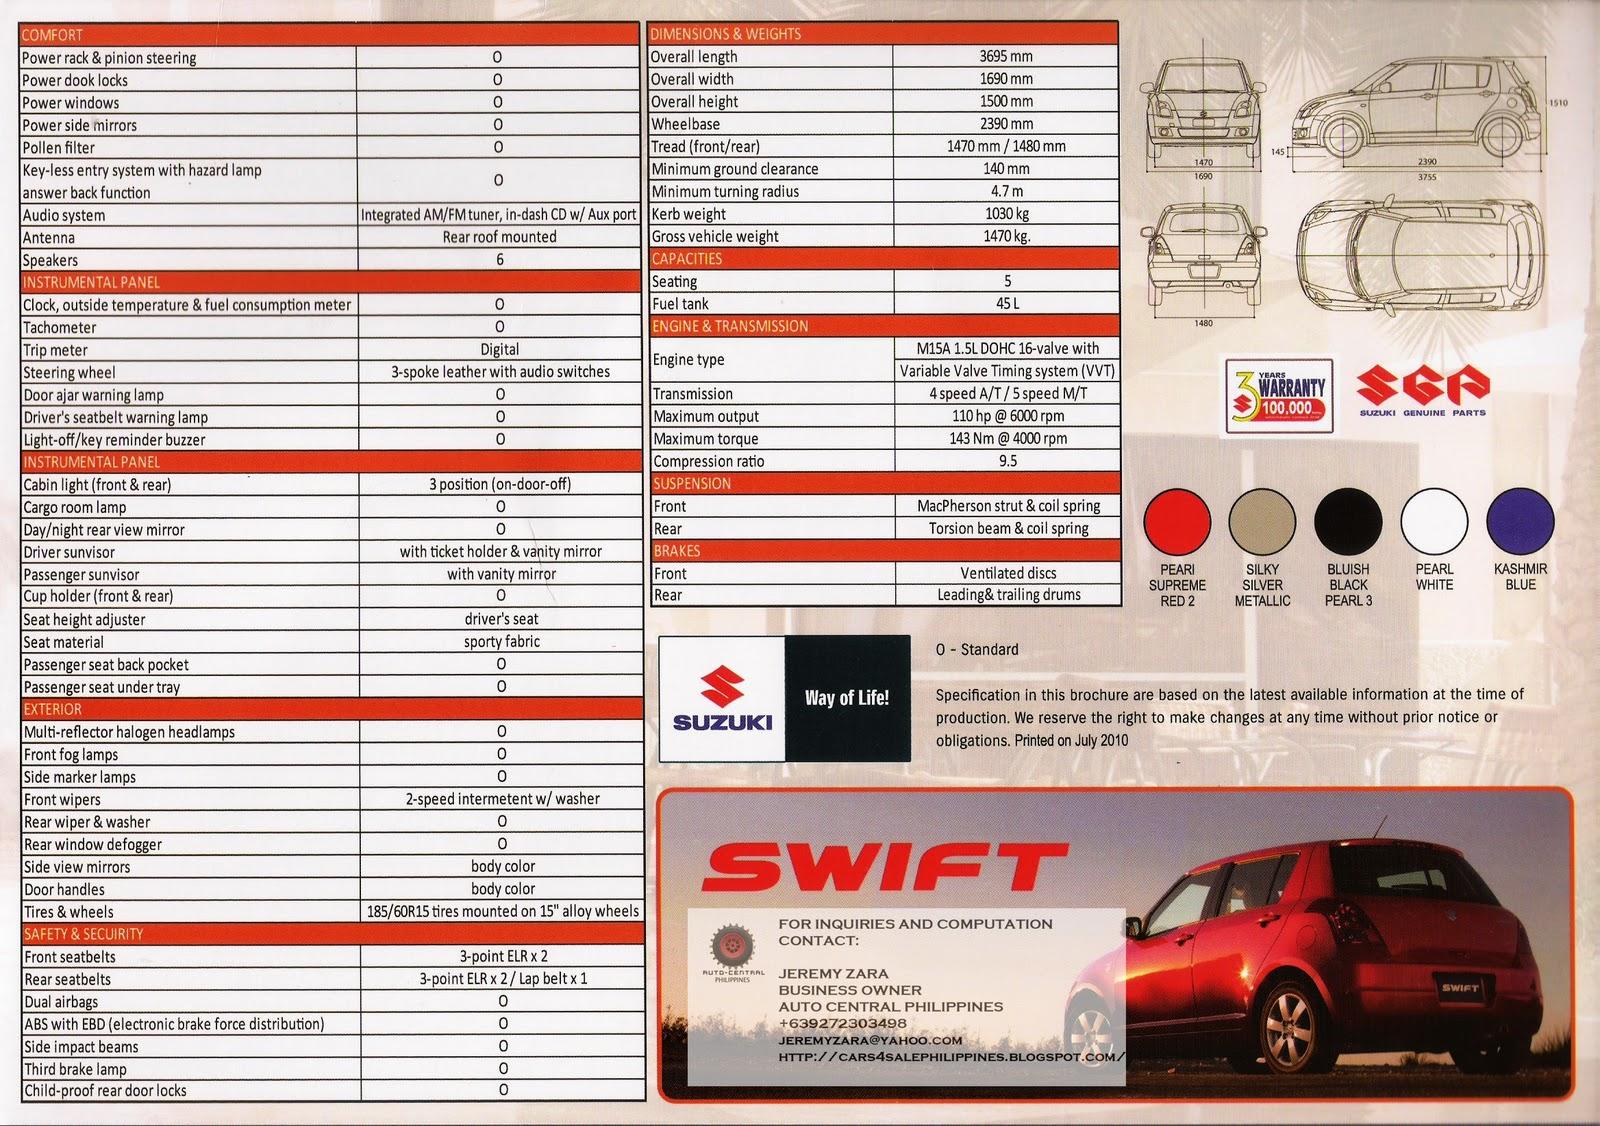 Brand New Cars For Sale Brand New Suzuki Swift For Sale